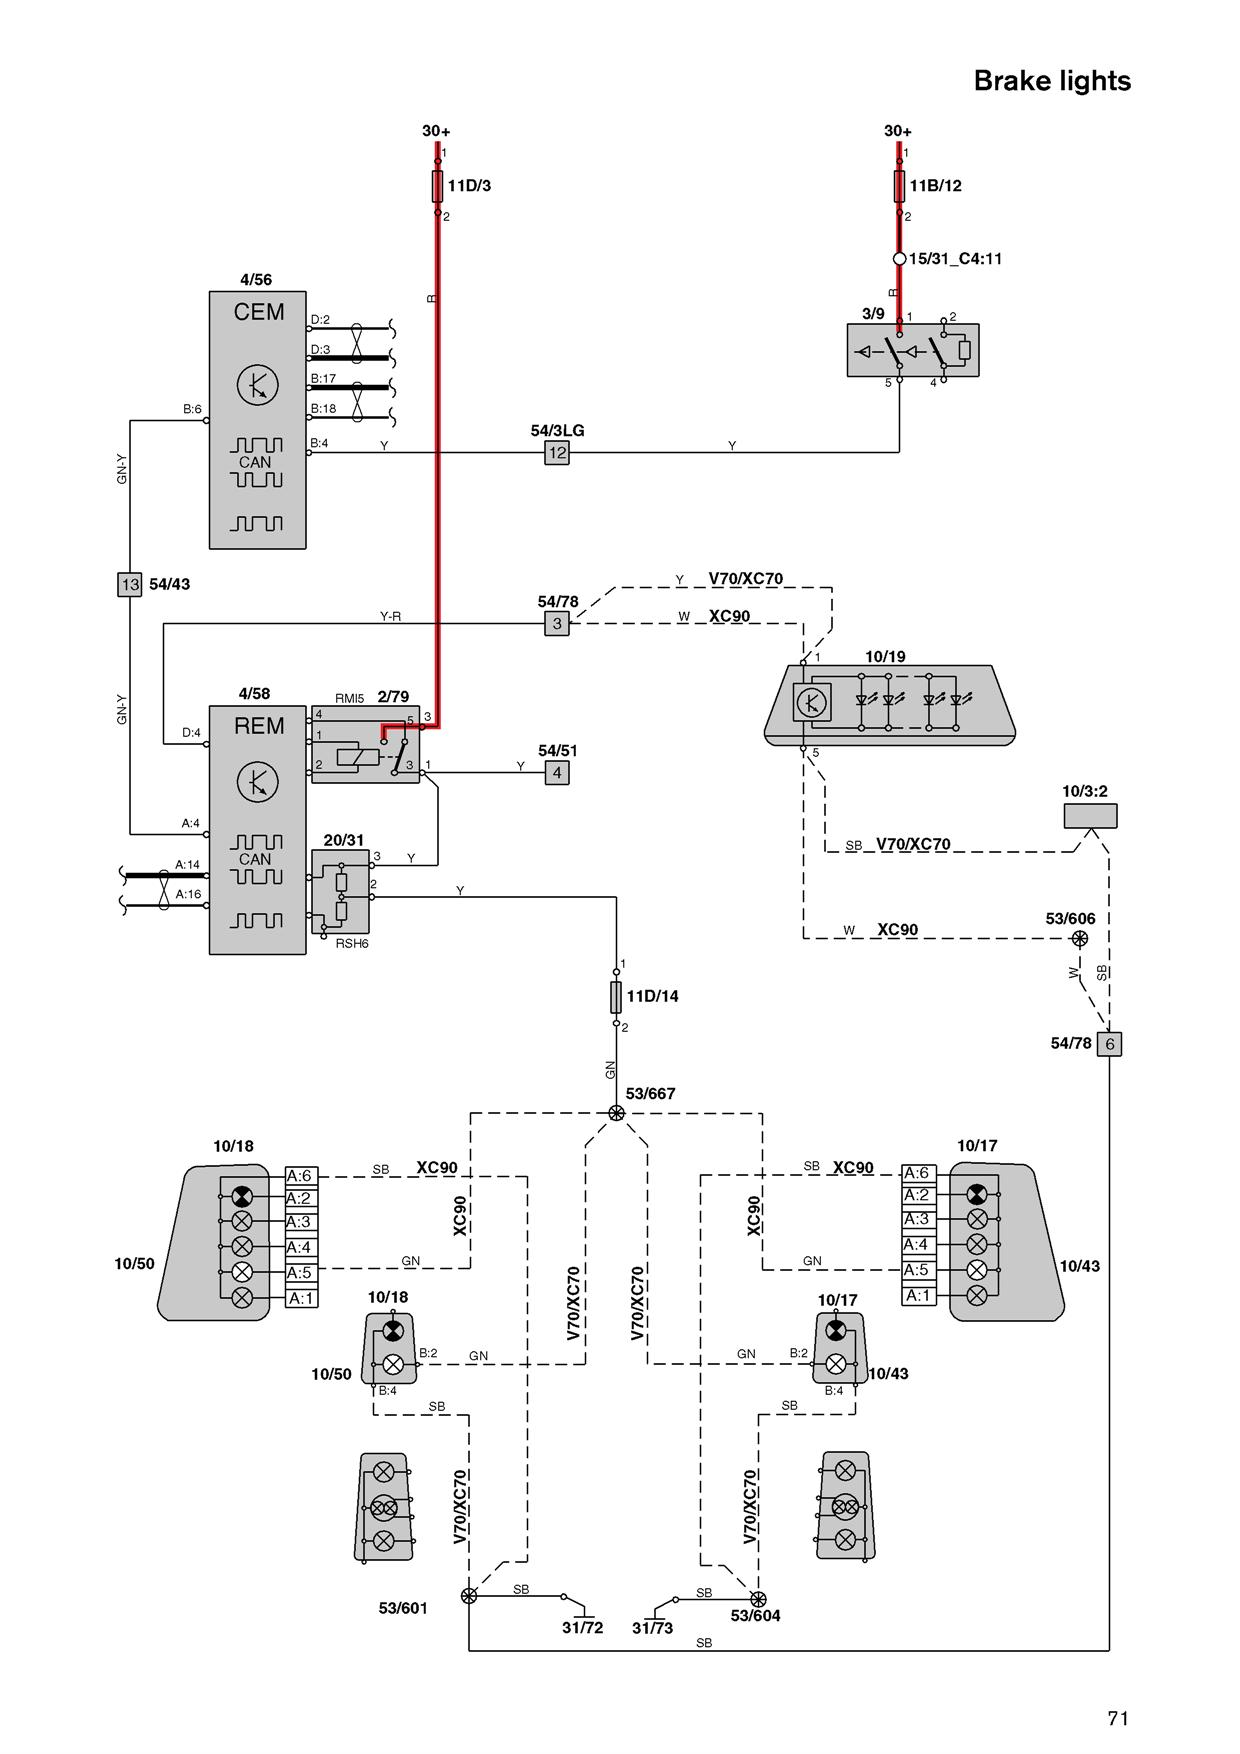 matthews volvo wiring diagrams volvo brakes wiring diagram